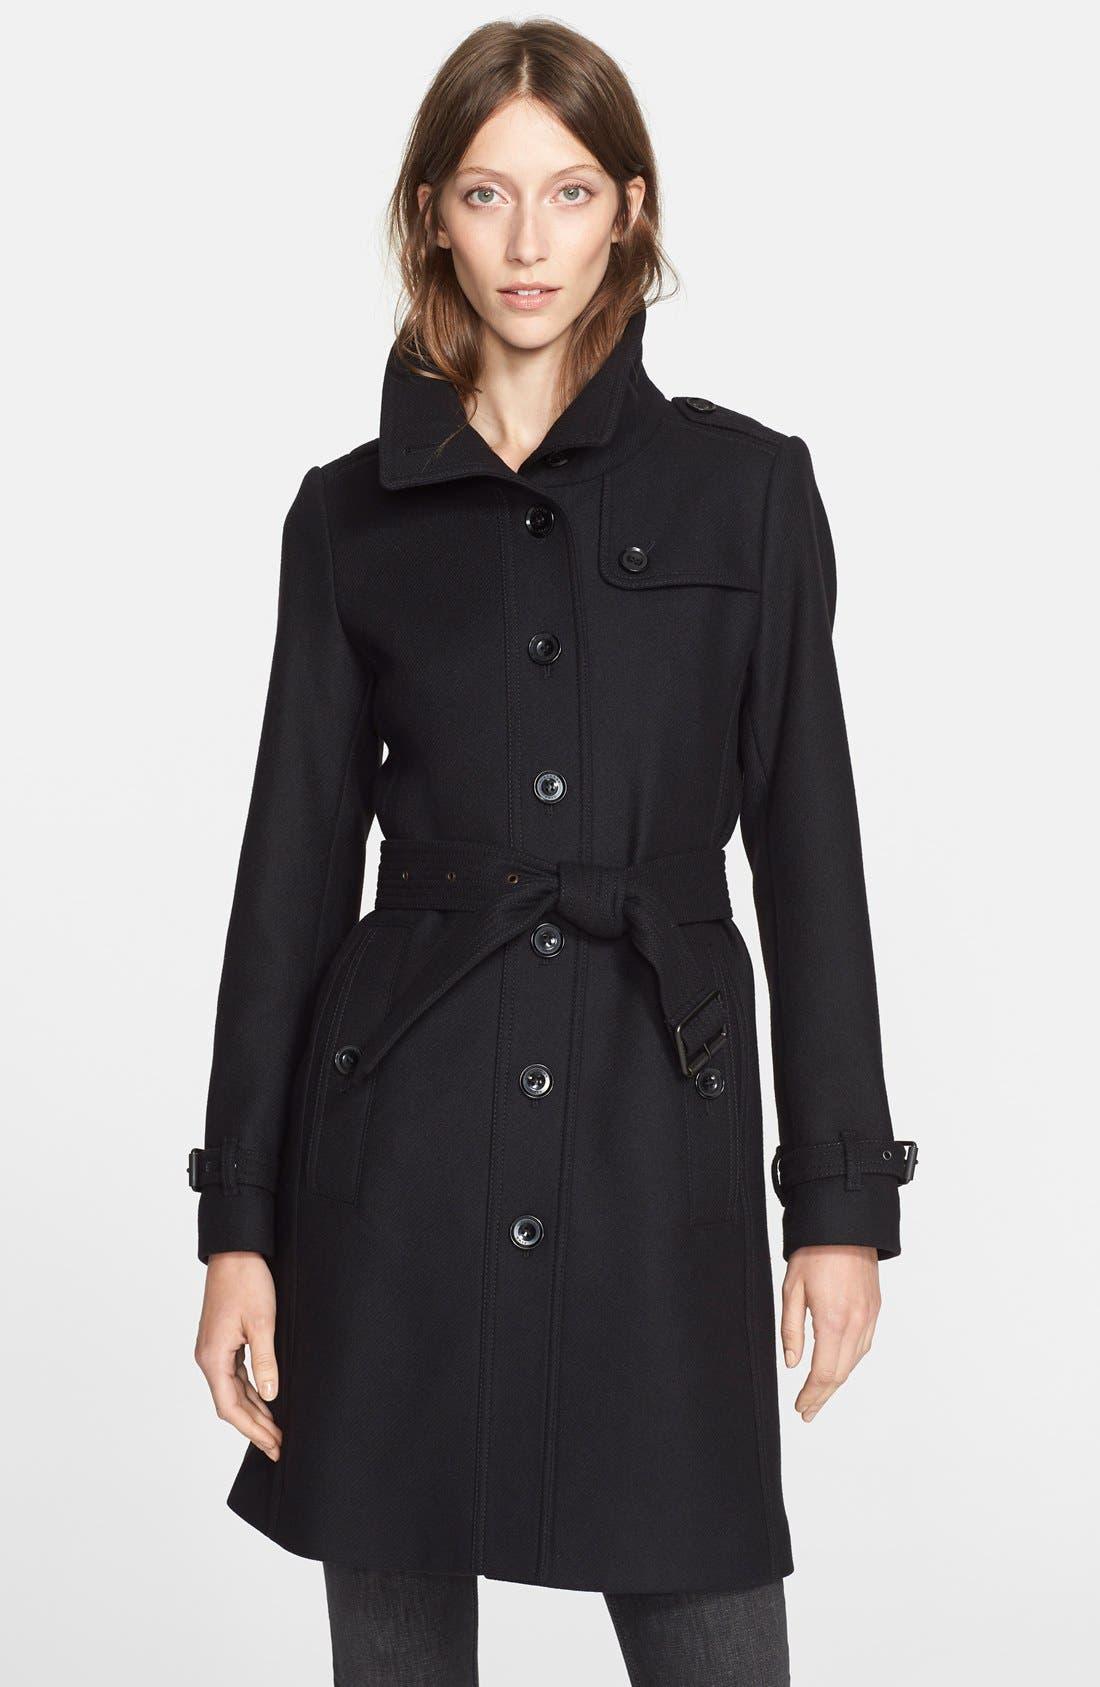 Alternate Image 1 Selected - Burberry Brit 'Rushfield' Wool Blend Single Breasted Coat